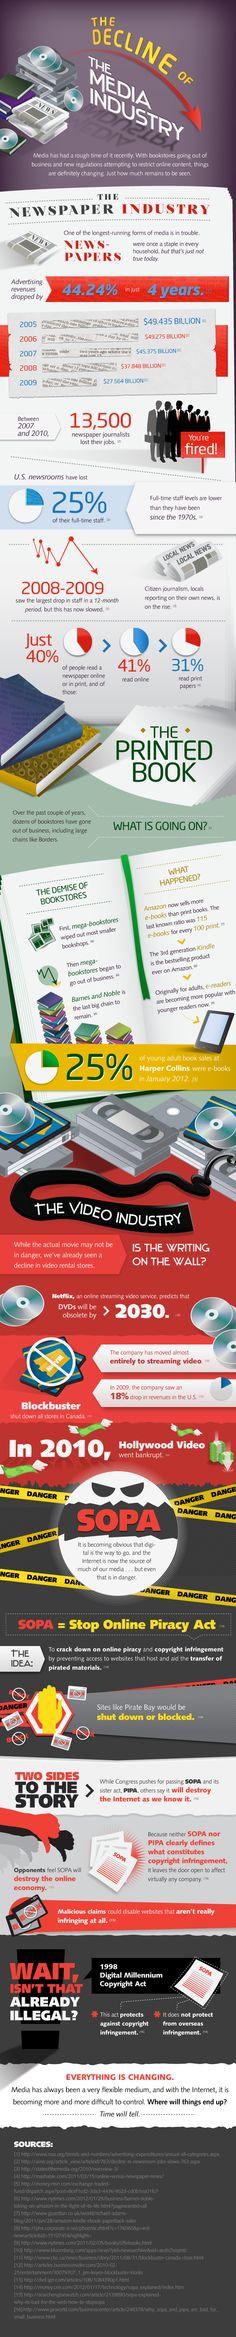 El ocaso de la industria de los Medios #Infografia #socialmedia #infographic #pymes